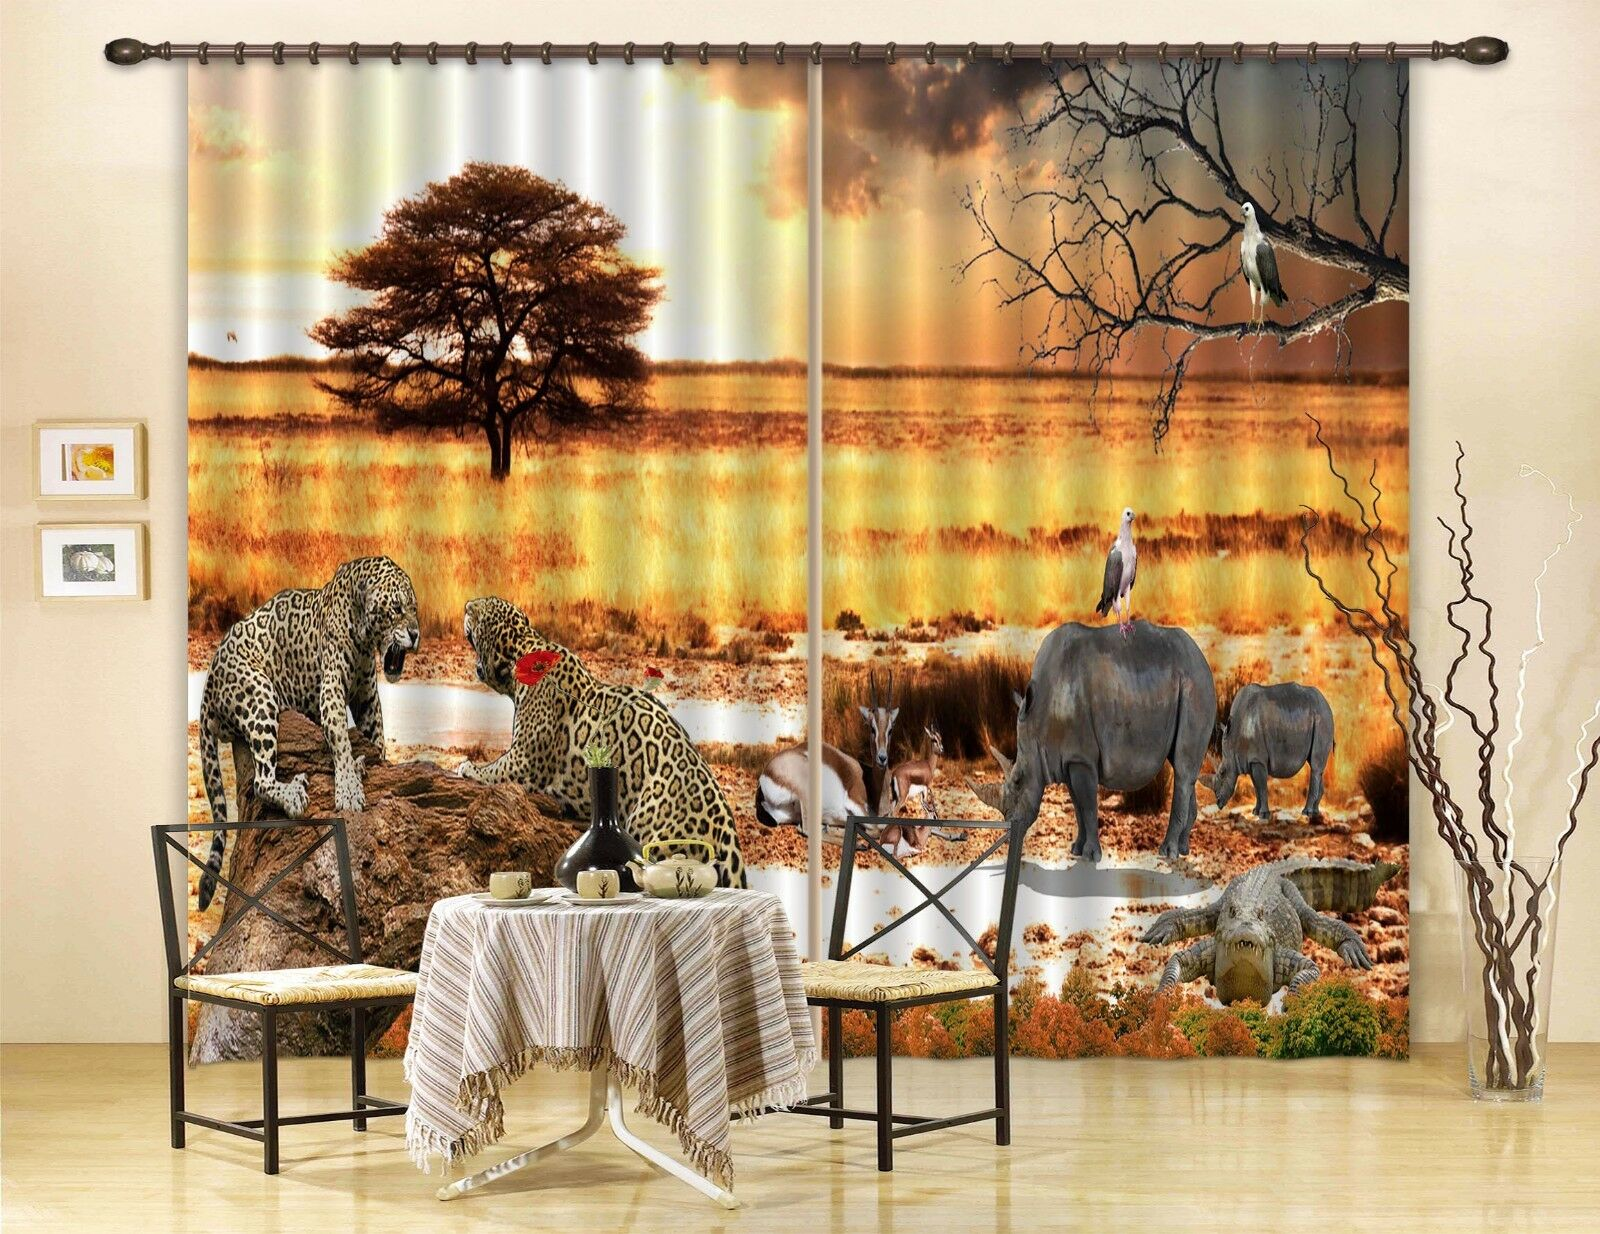 3D elefantenwiese 8 Cortinas de impresión de Cortina Blockout Foto Tela Cortinas Ventana au